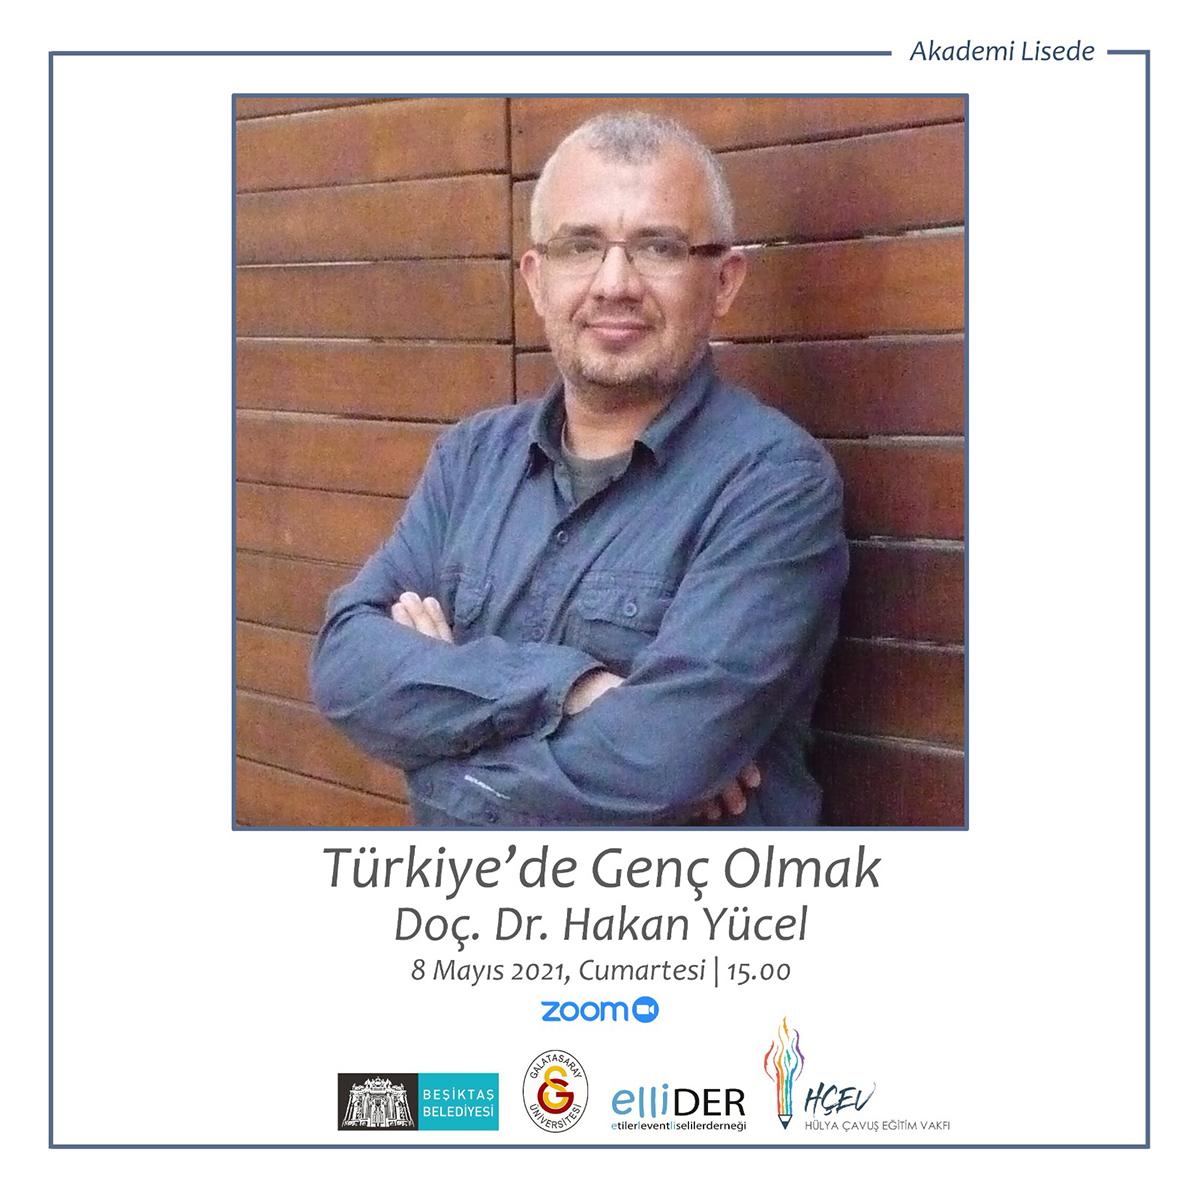 doc-dr-hakan-yucel